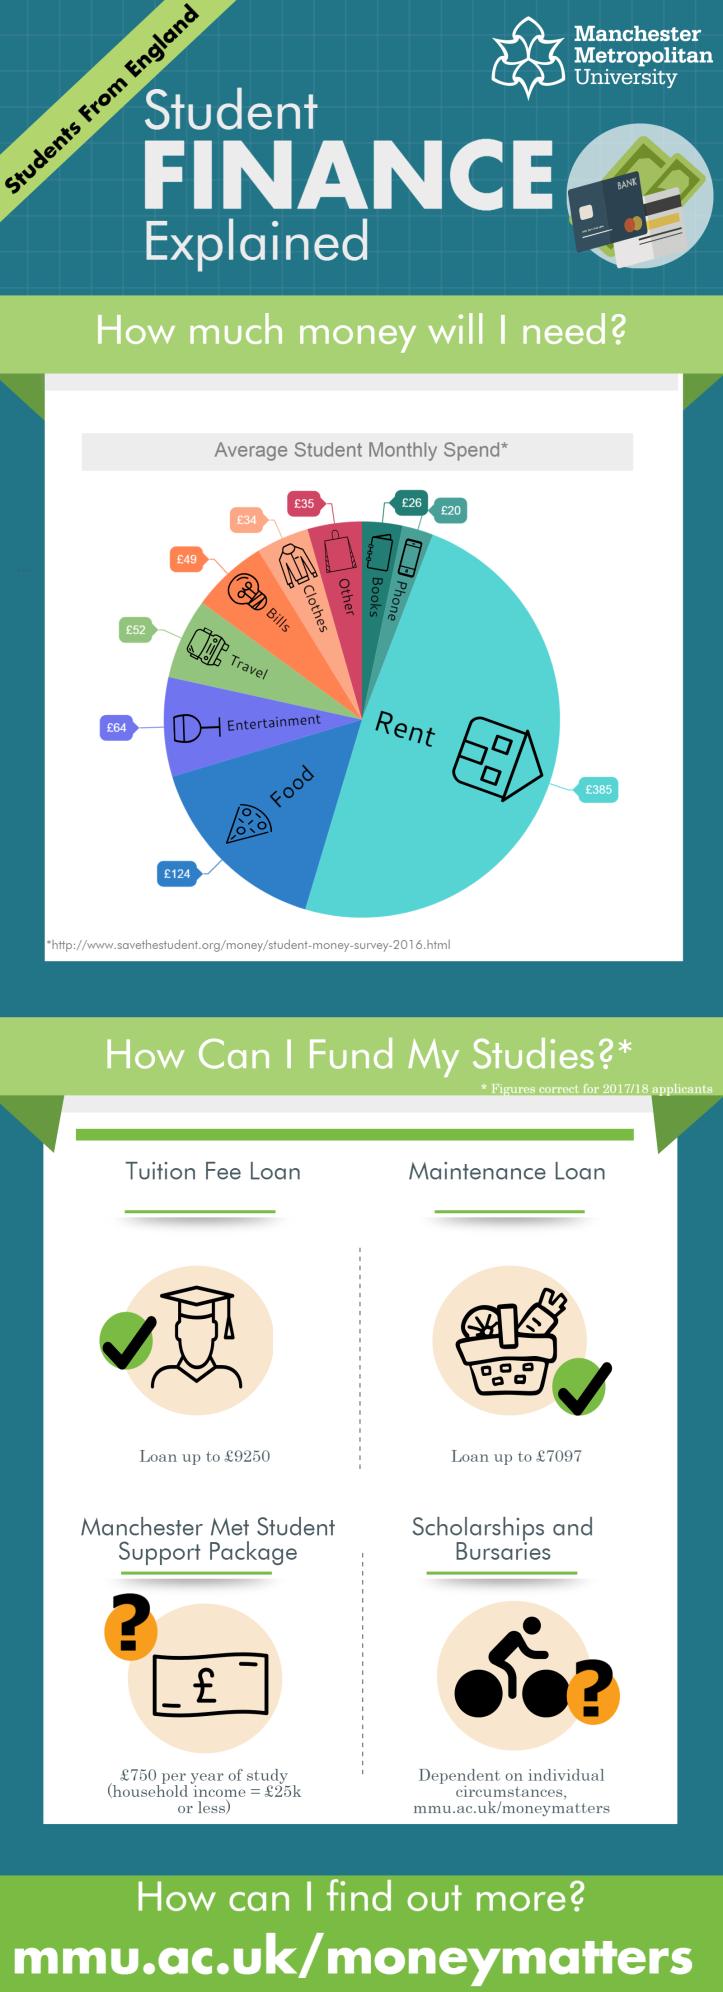 Student Finance 2017